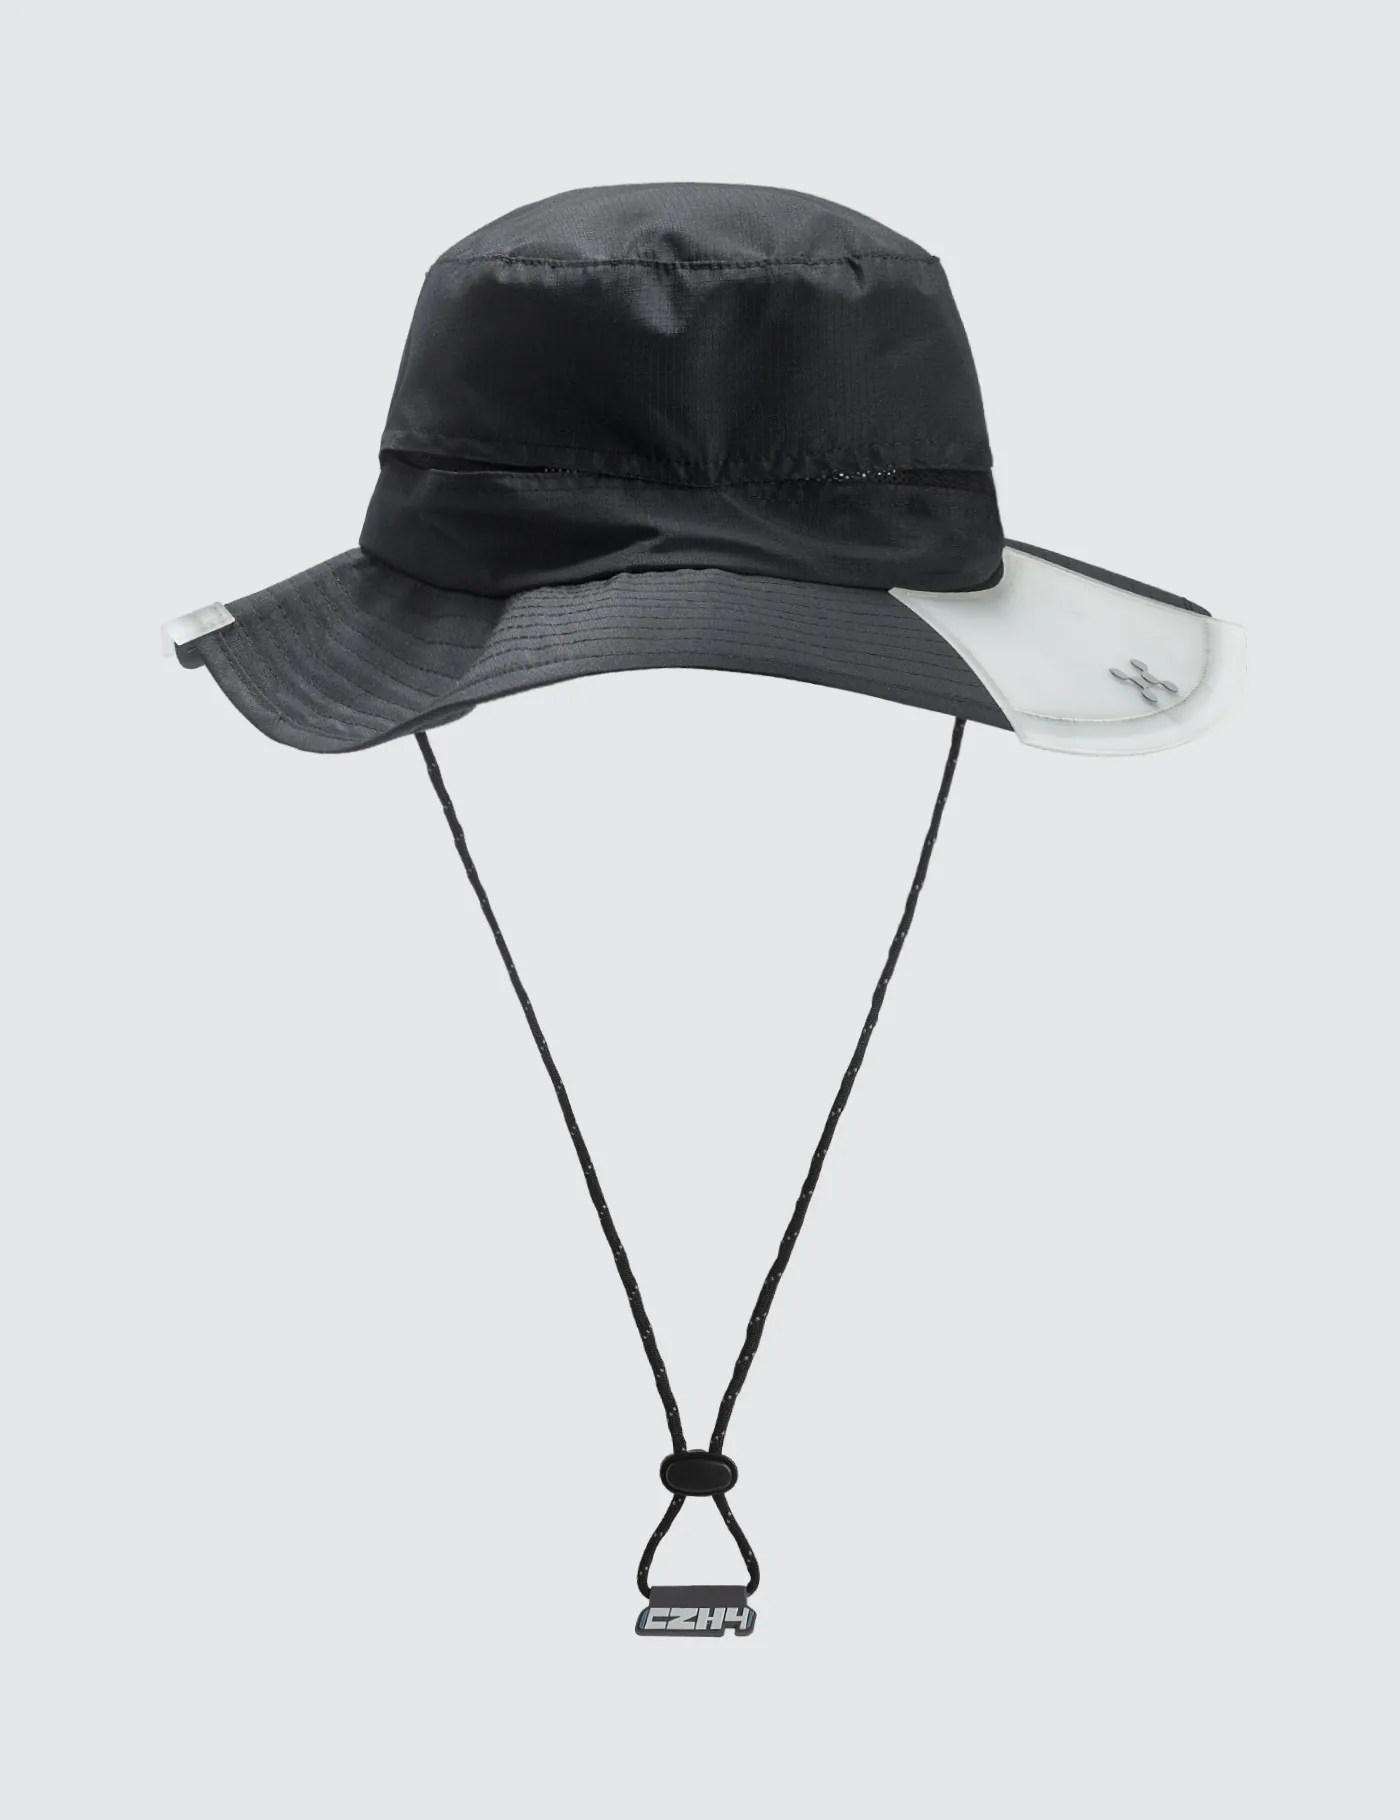 C2H4 BUCKET HAT